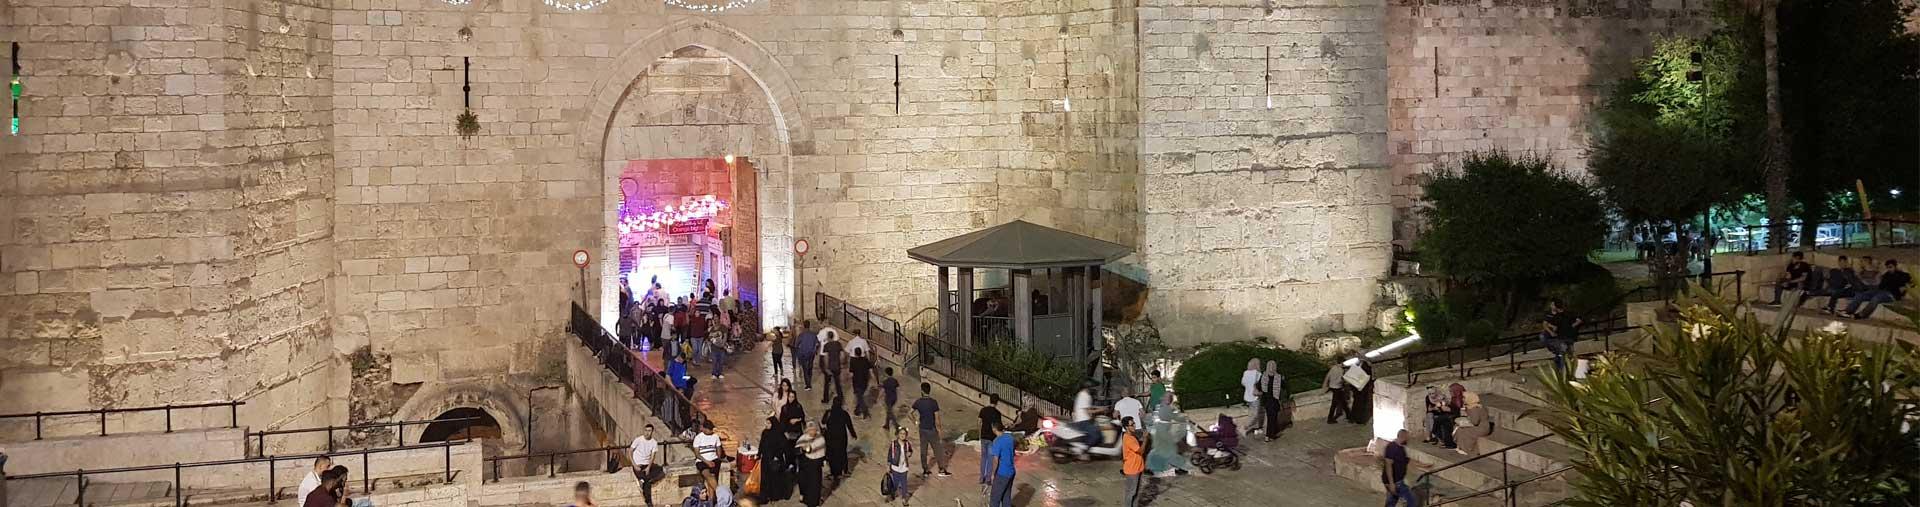 Muslim quarter at night